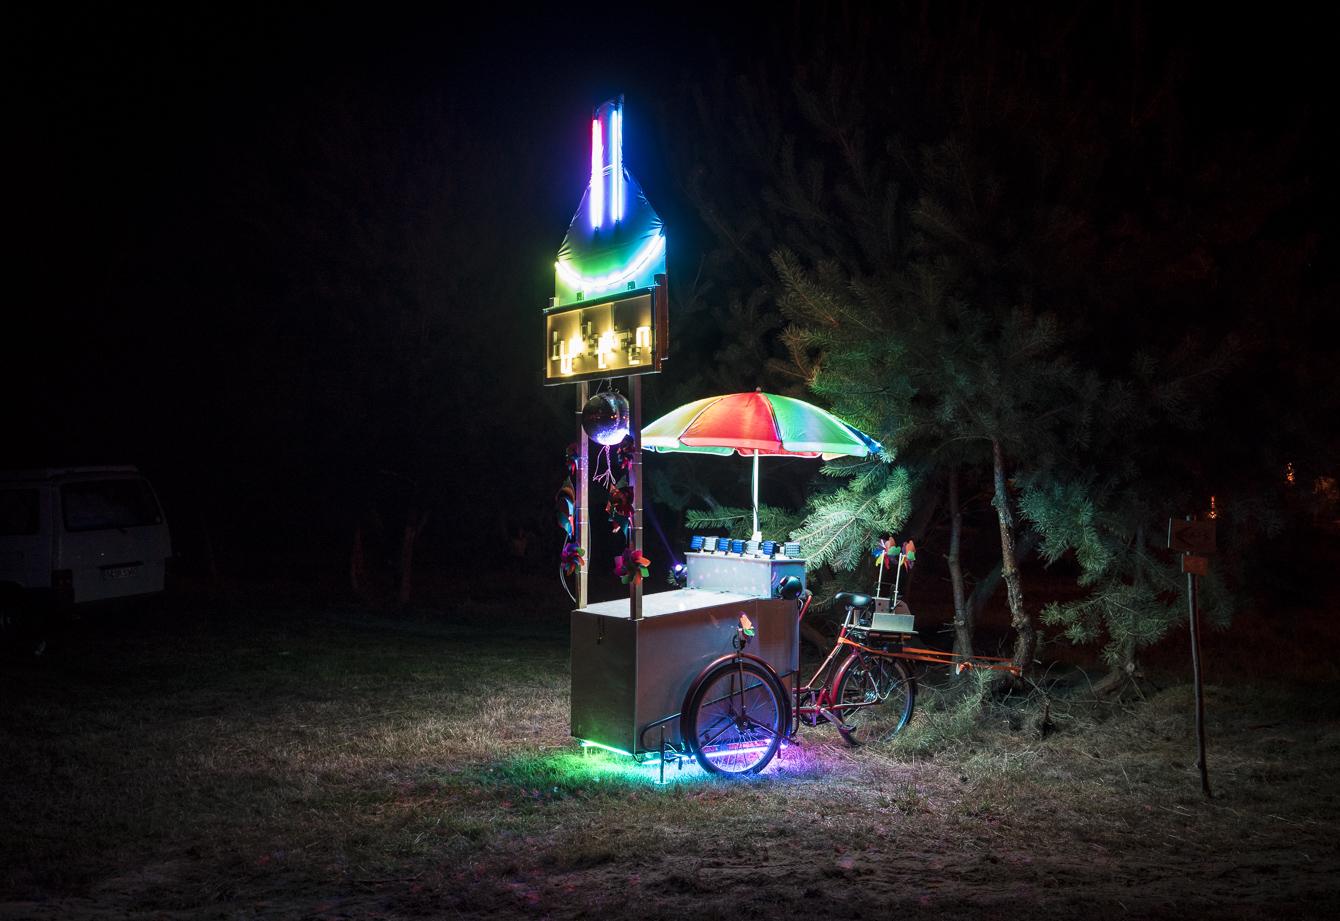 Festival Summer 2014 abandoned installation at garbicz festival 2014